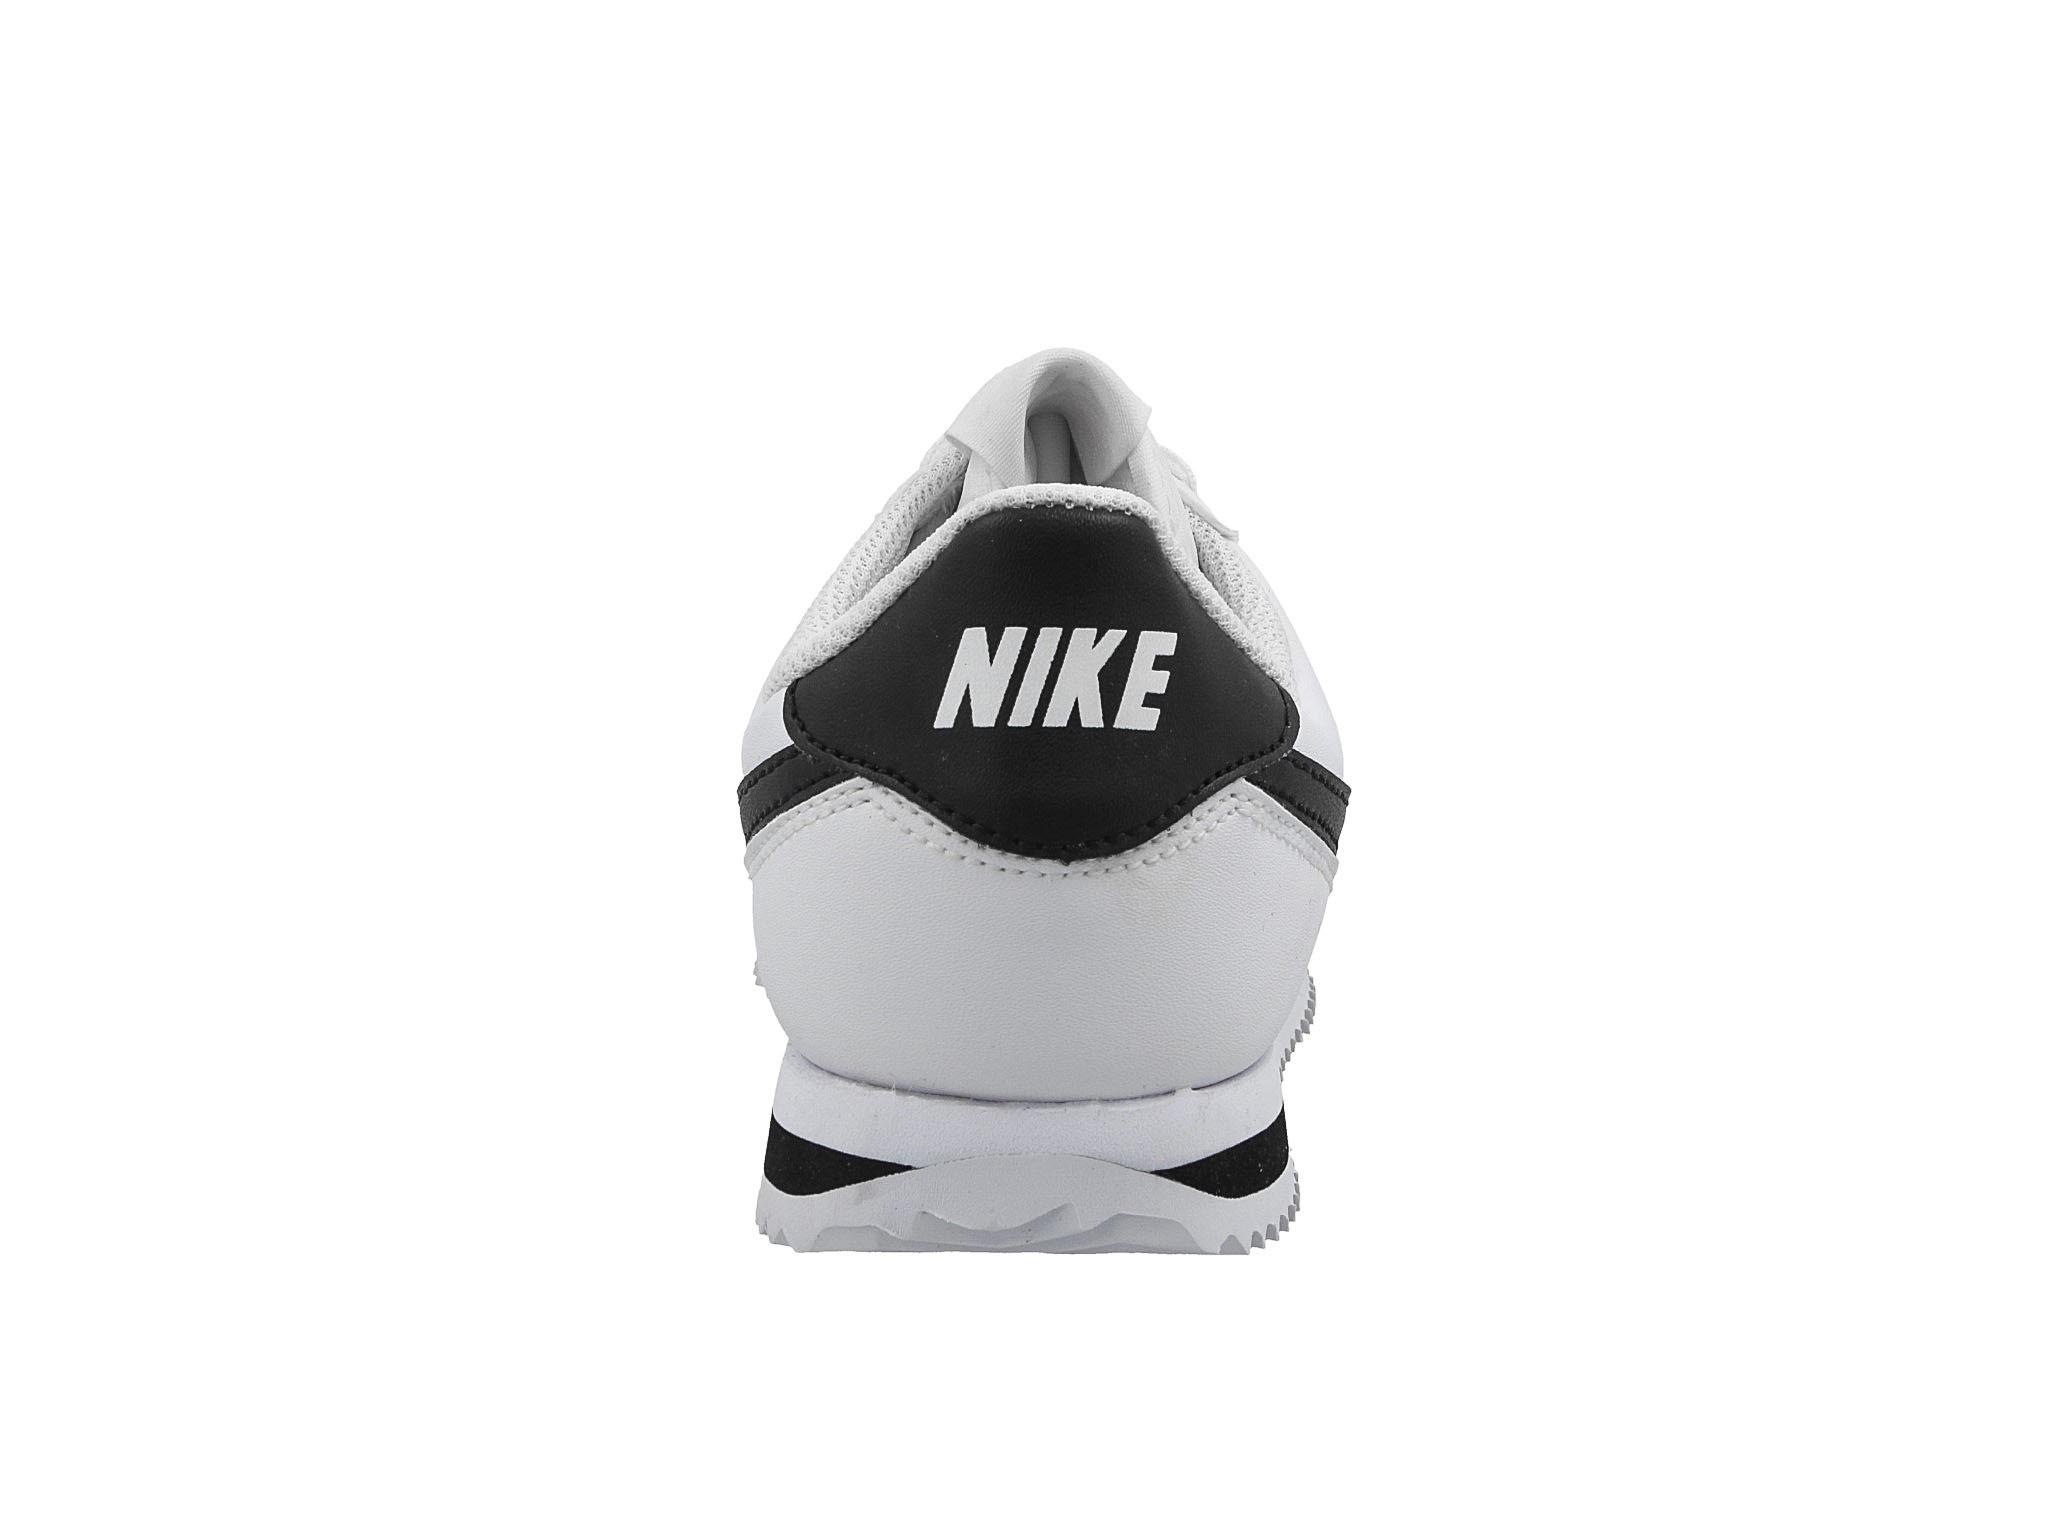 Cipő NIKE Cortez Basic Sl (GS) 904764 102 WhiteBlack